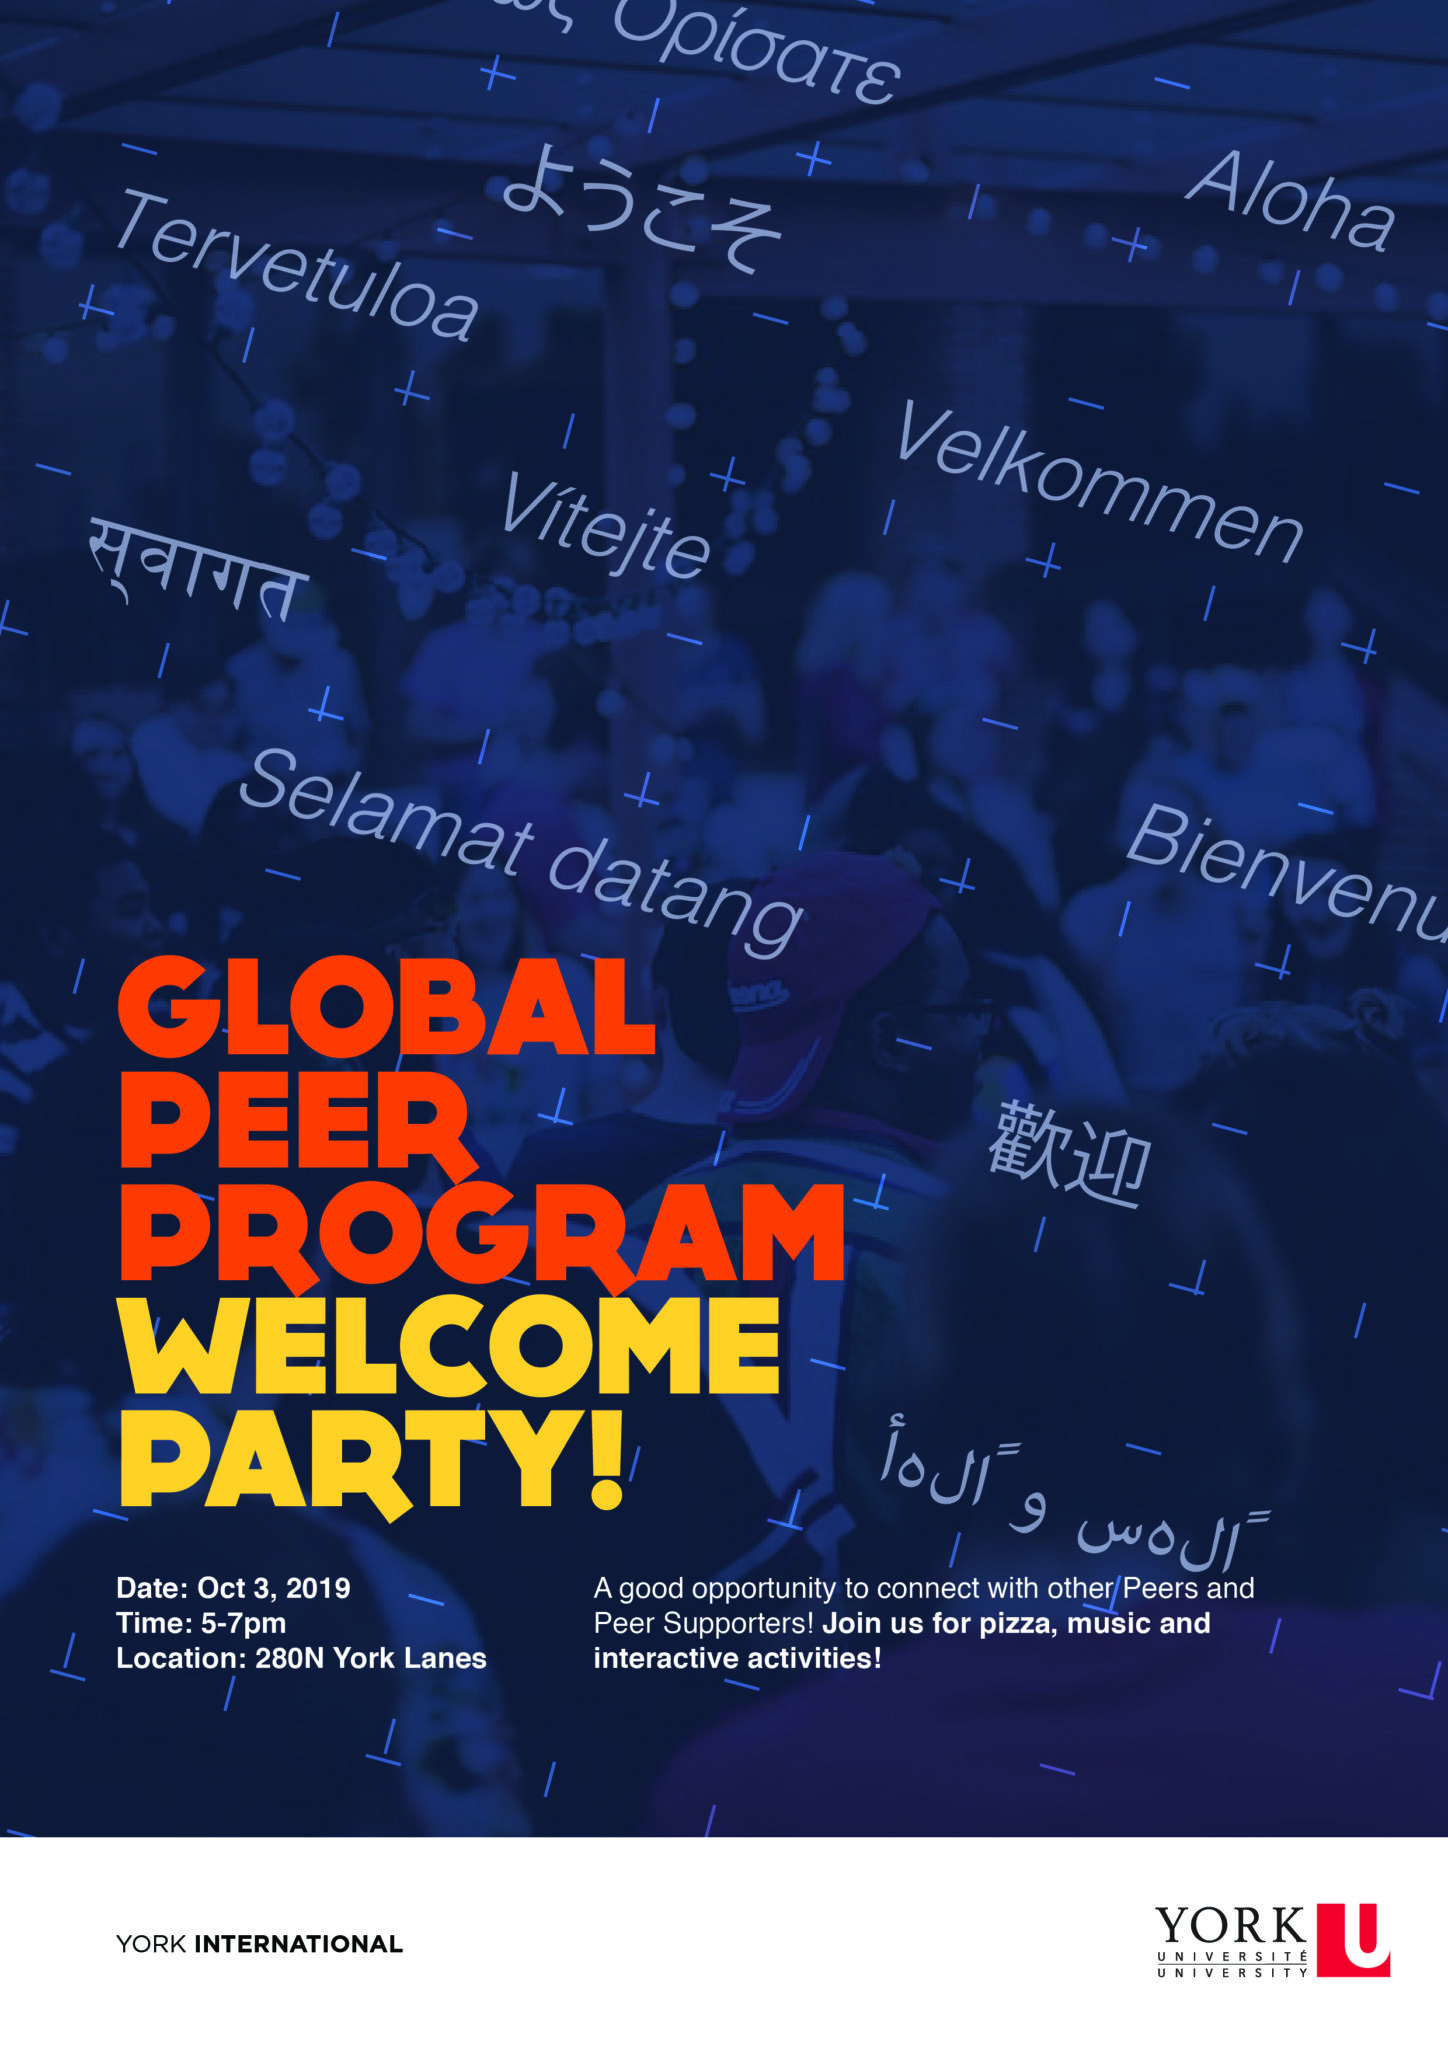 Global Peer Program Welcome Party @ 280N York Lanes | Toronto | Ontario | Canada